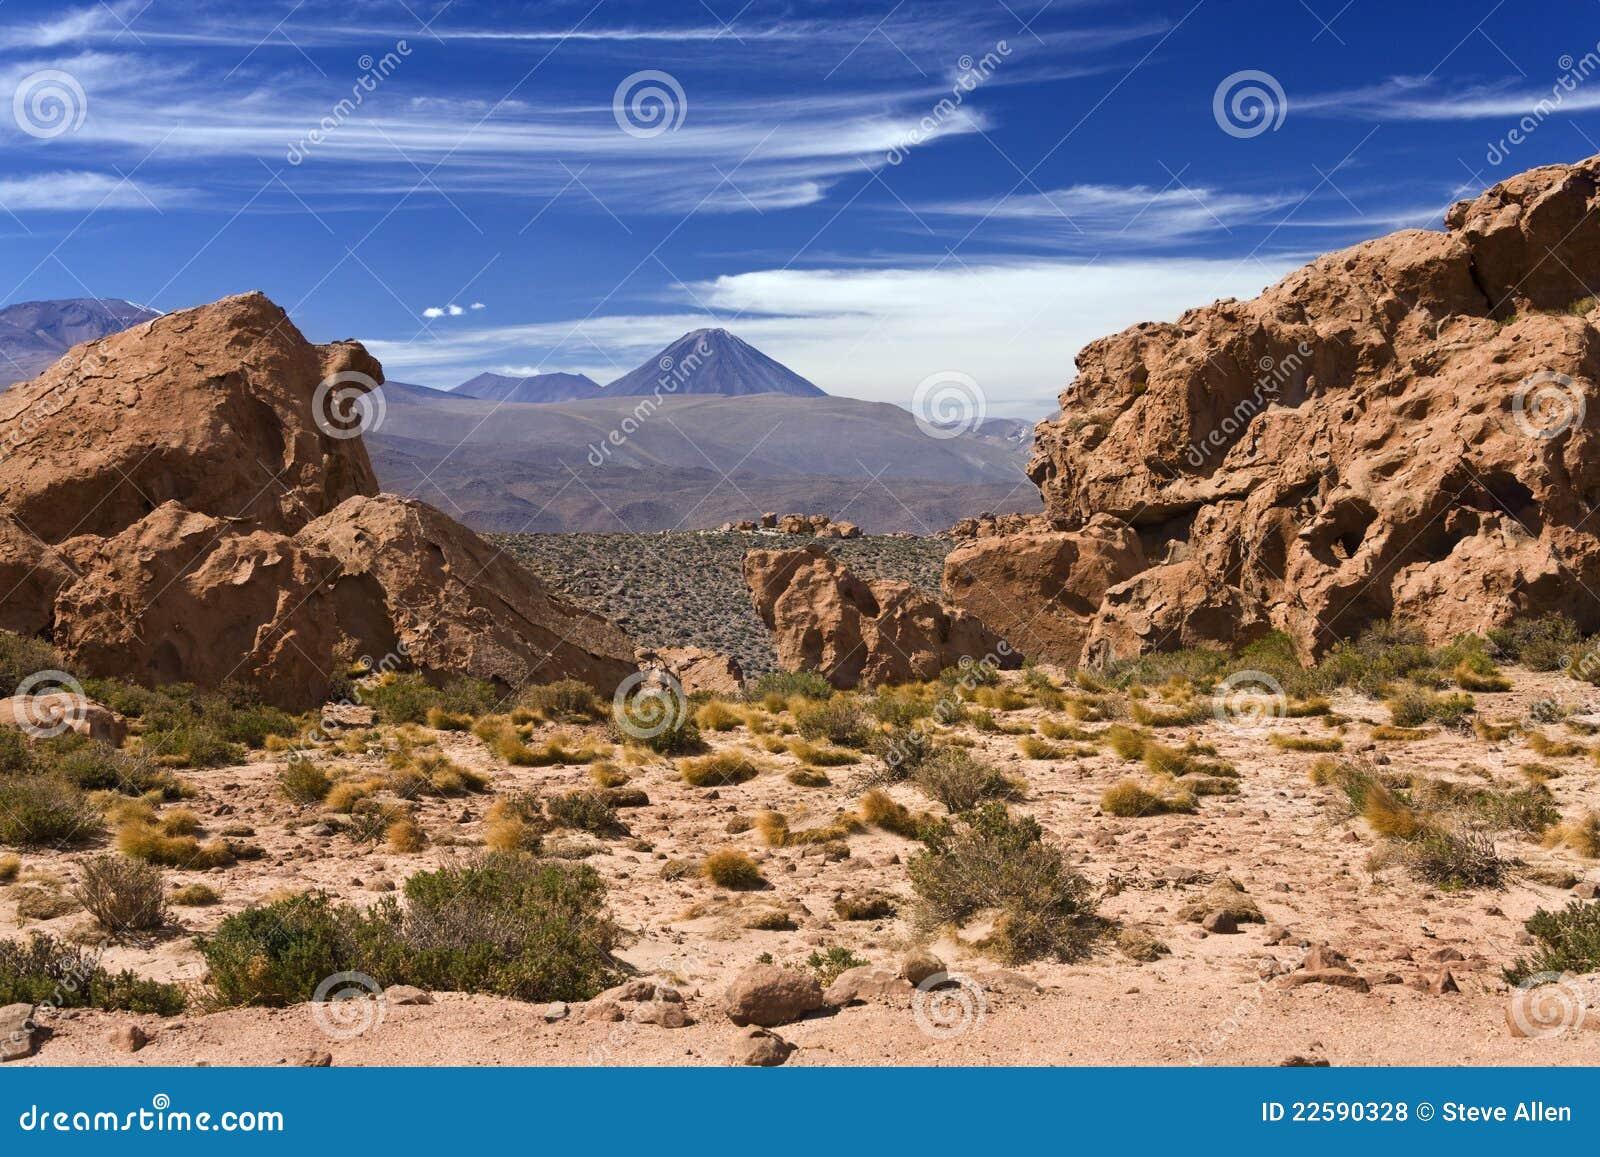 Licancabur Volcano - Atacama Desert - Chile